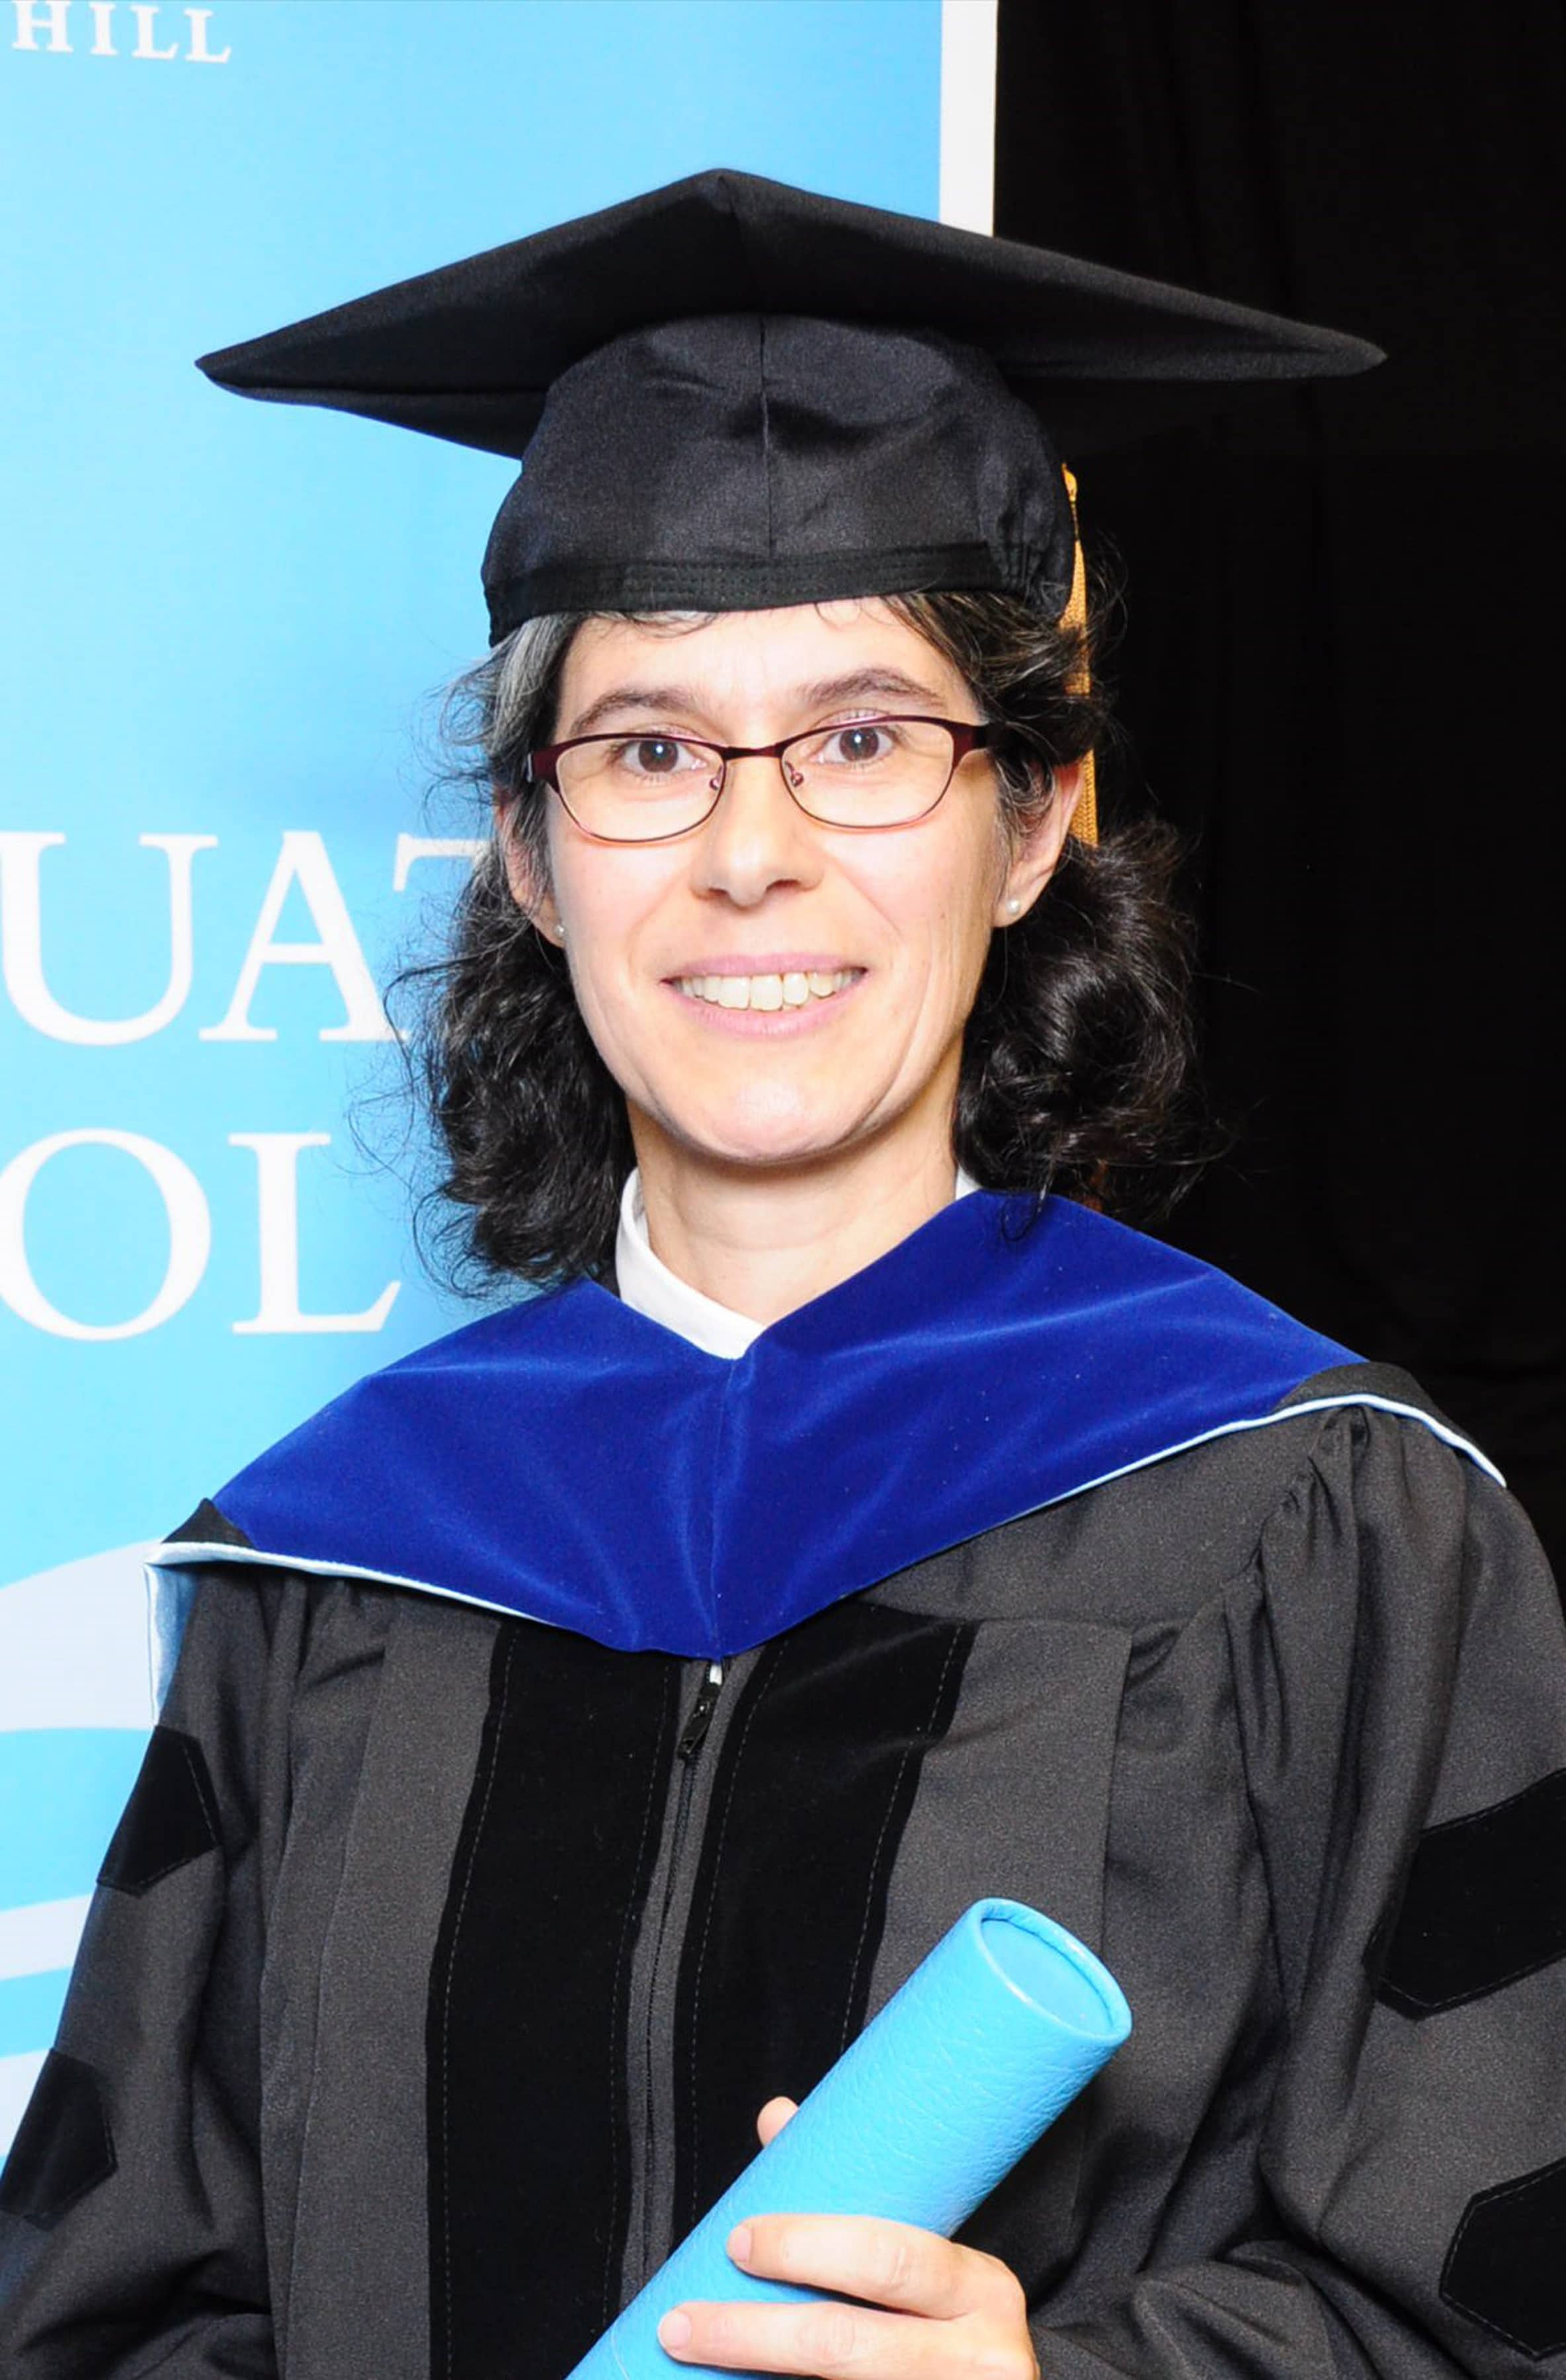 UNC_Graduation_12132015